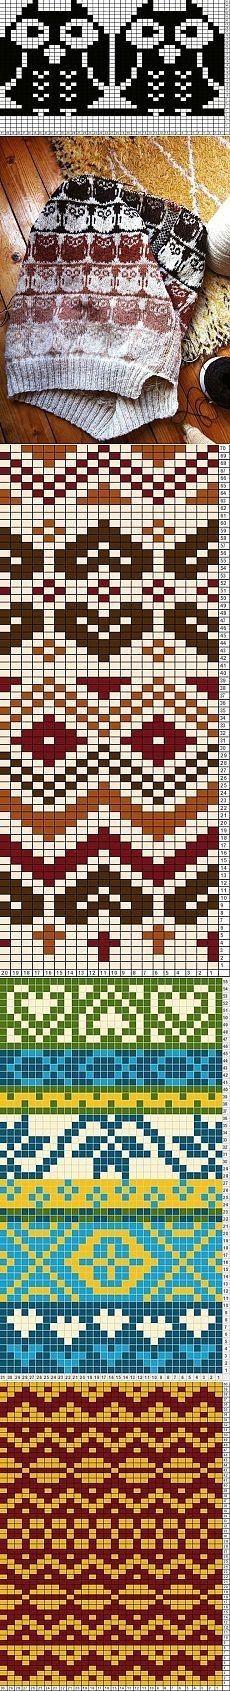 current Images knitting charts owl Style жаккард Most current Images knitting charts owl Style жаккард ВЯЗАНИЕ ДЛЯ СУМАСШЕДШИХ / Снимка 67 - Burda 2018 - svetlyachoks Owl Crochet Chart pattern by Agnes Barton annadrianna — «Pattern Libra. Fair Isle Knitting Patterns, Fair Isle Pattern, Knitting Charts, Loom Knitting, Knitting Stitches, Knitting Designs, Baby Knitting, Knitted Baby, Knitting Ideas